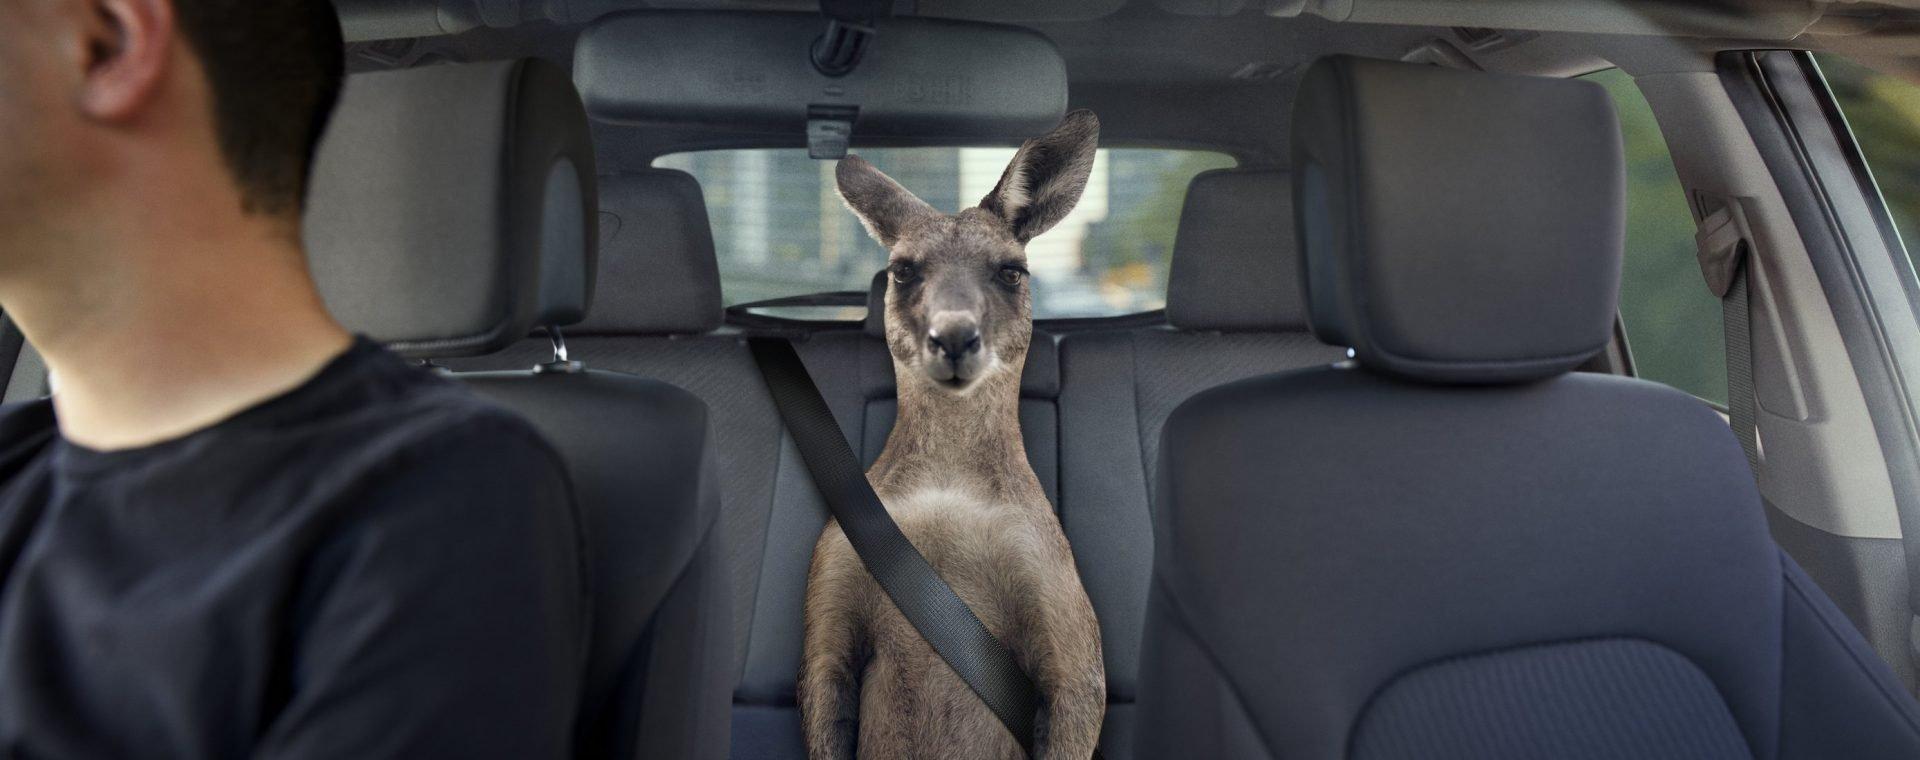 qantas_uber_kangaroo_kredmo_blog